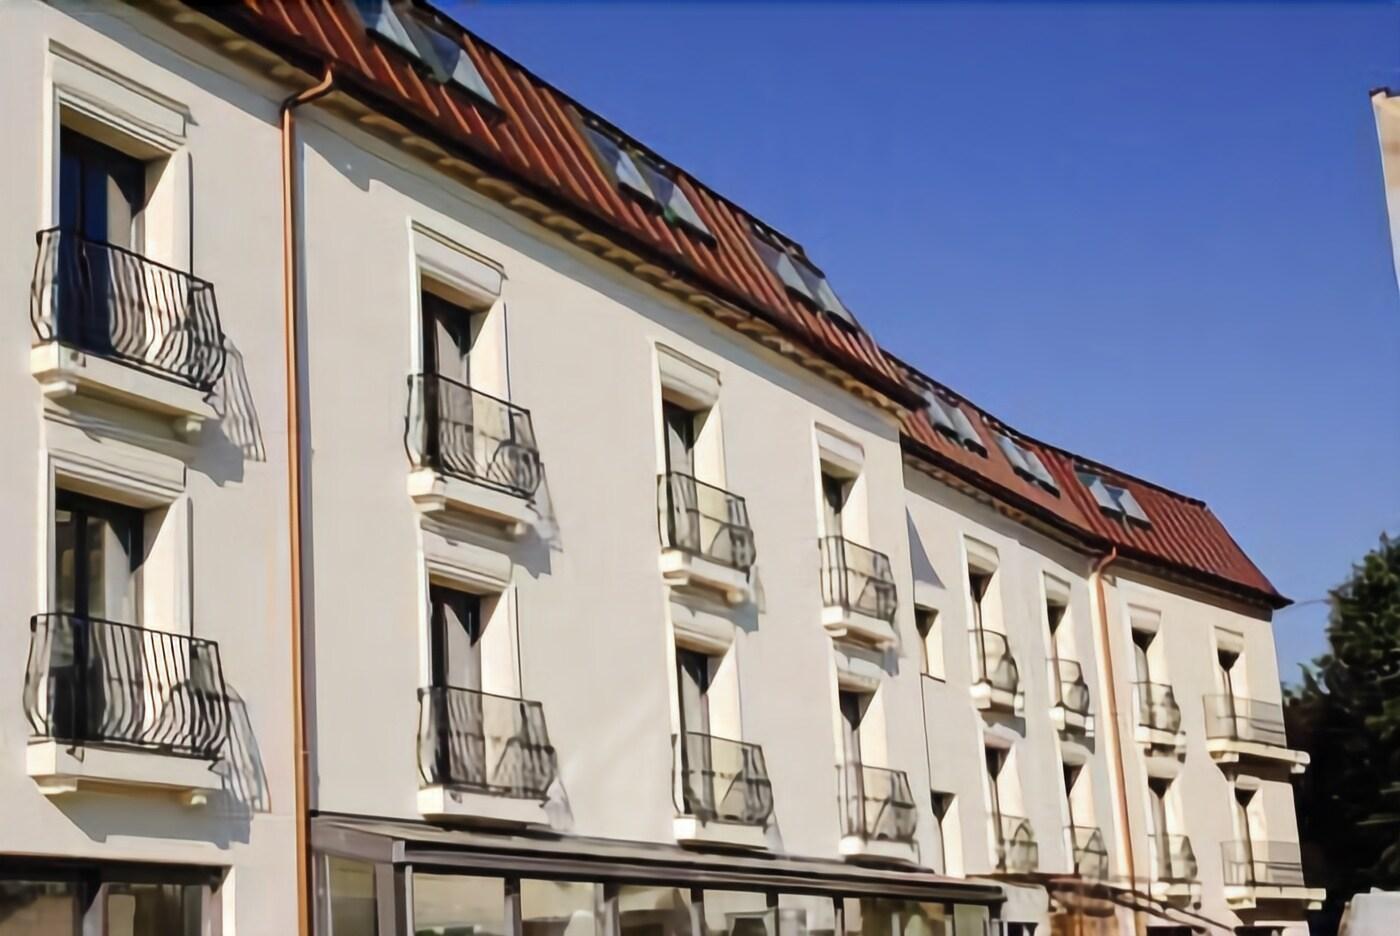 Satu Mare City Hotel